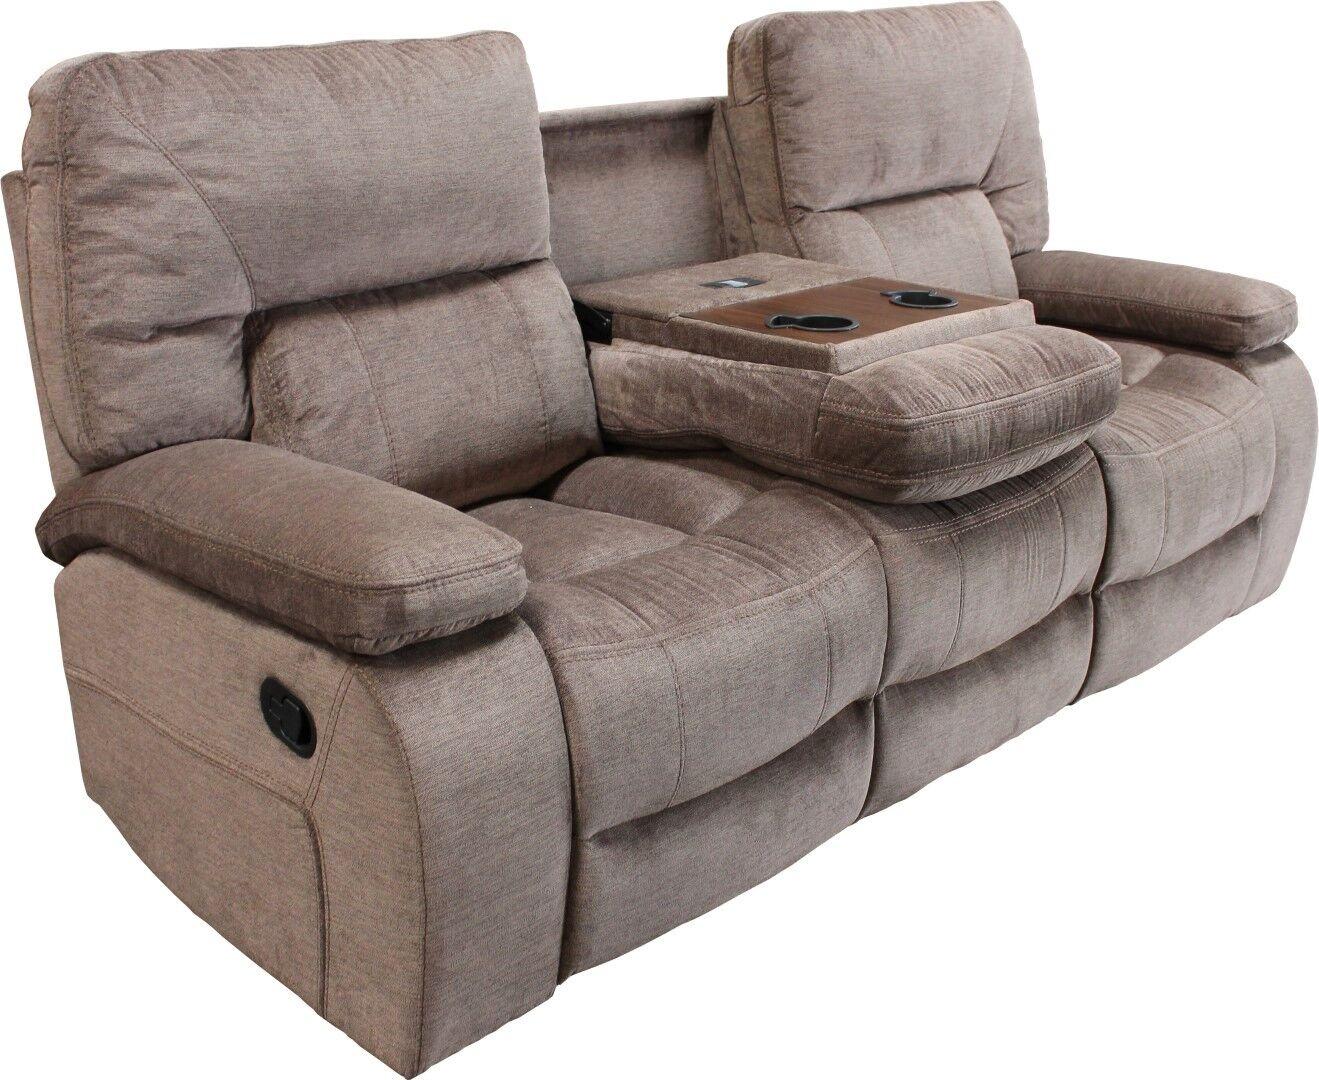 Contemporary Reclining Sofa Tiendamia